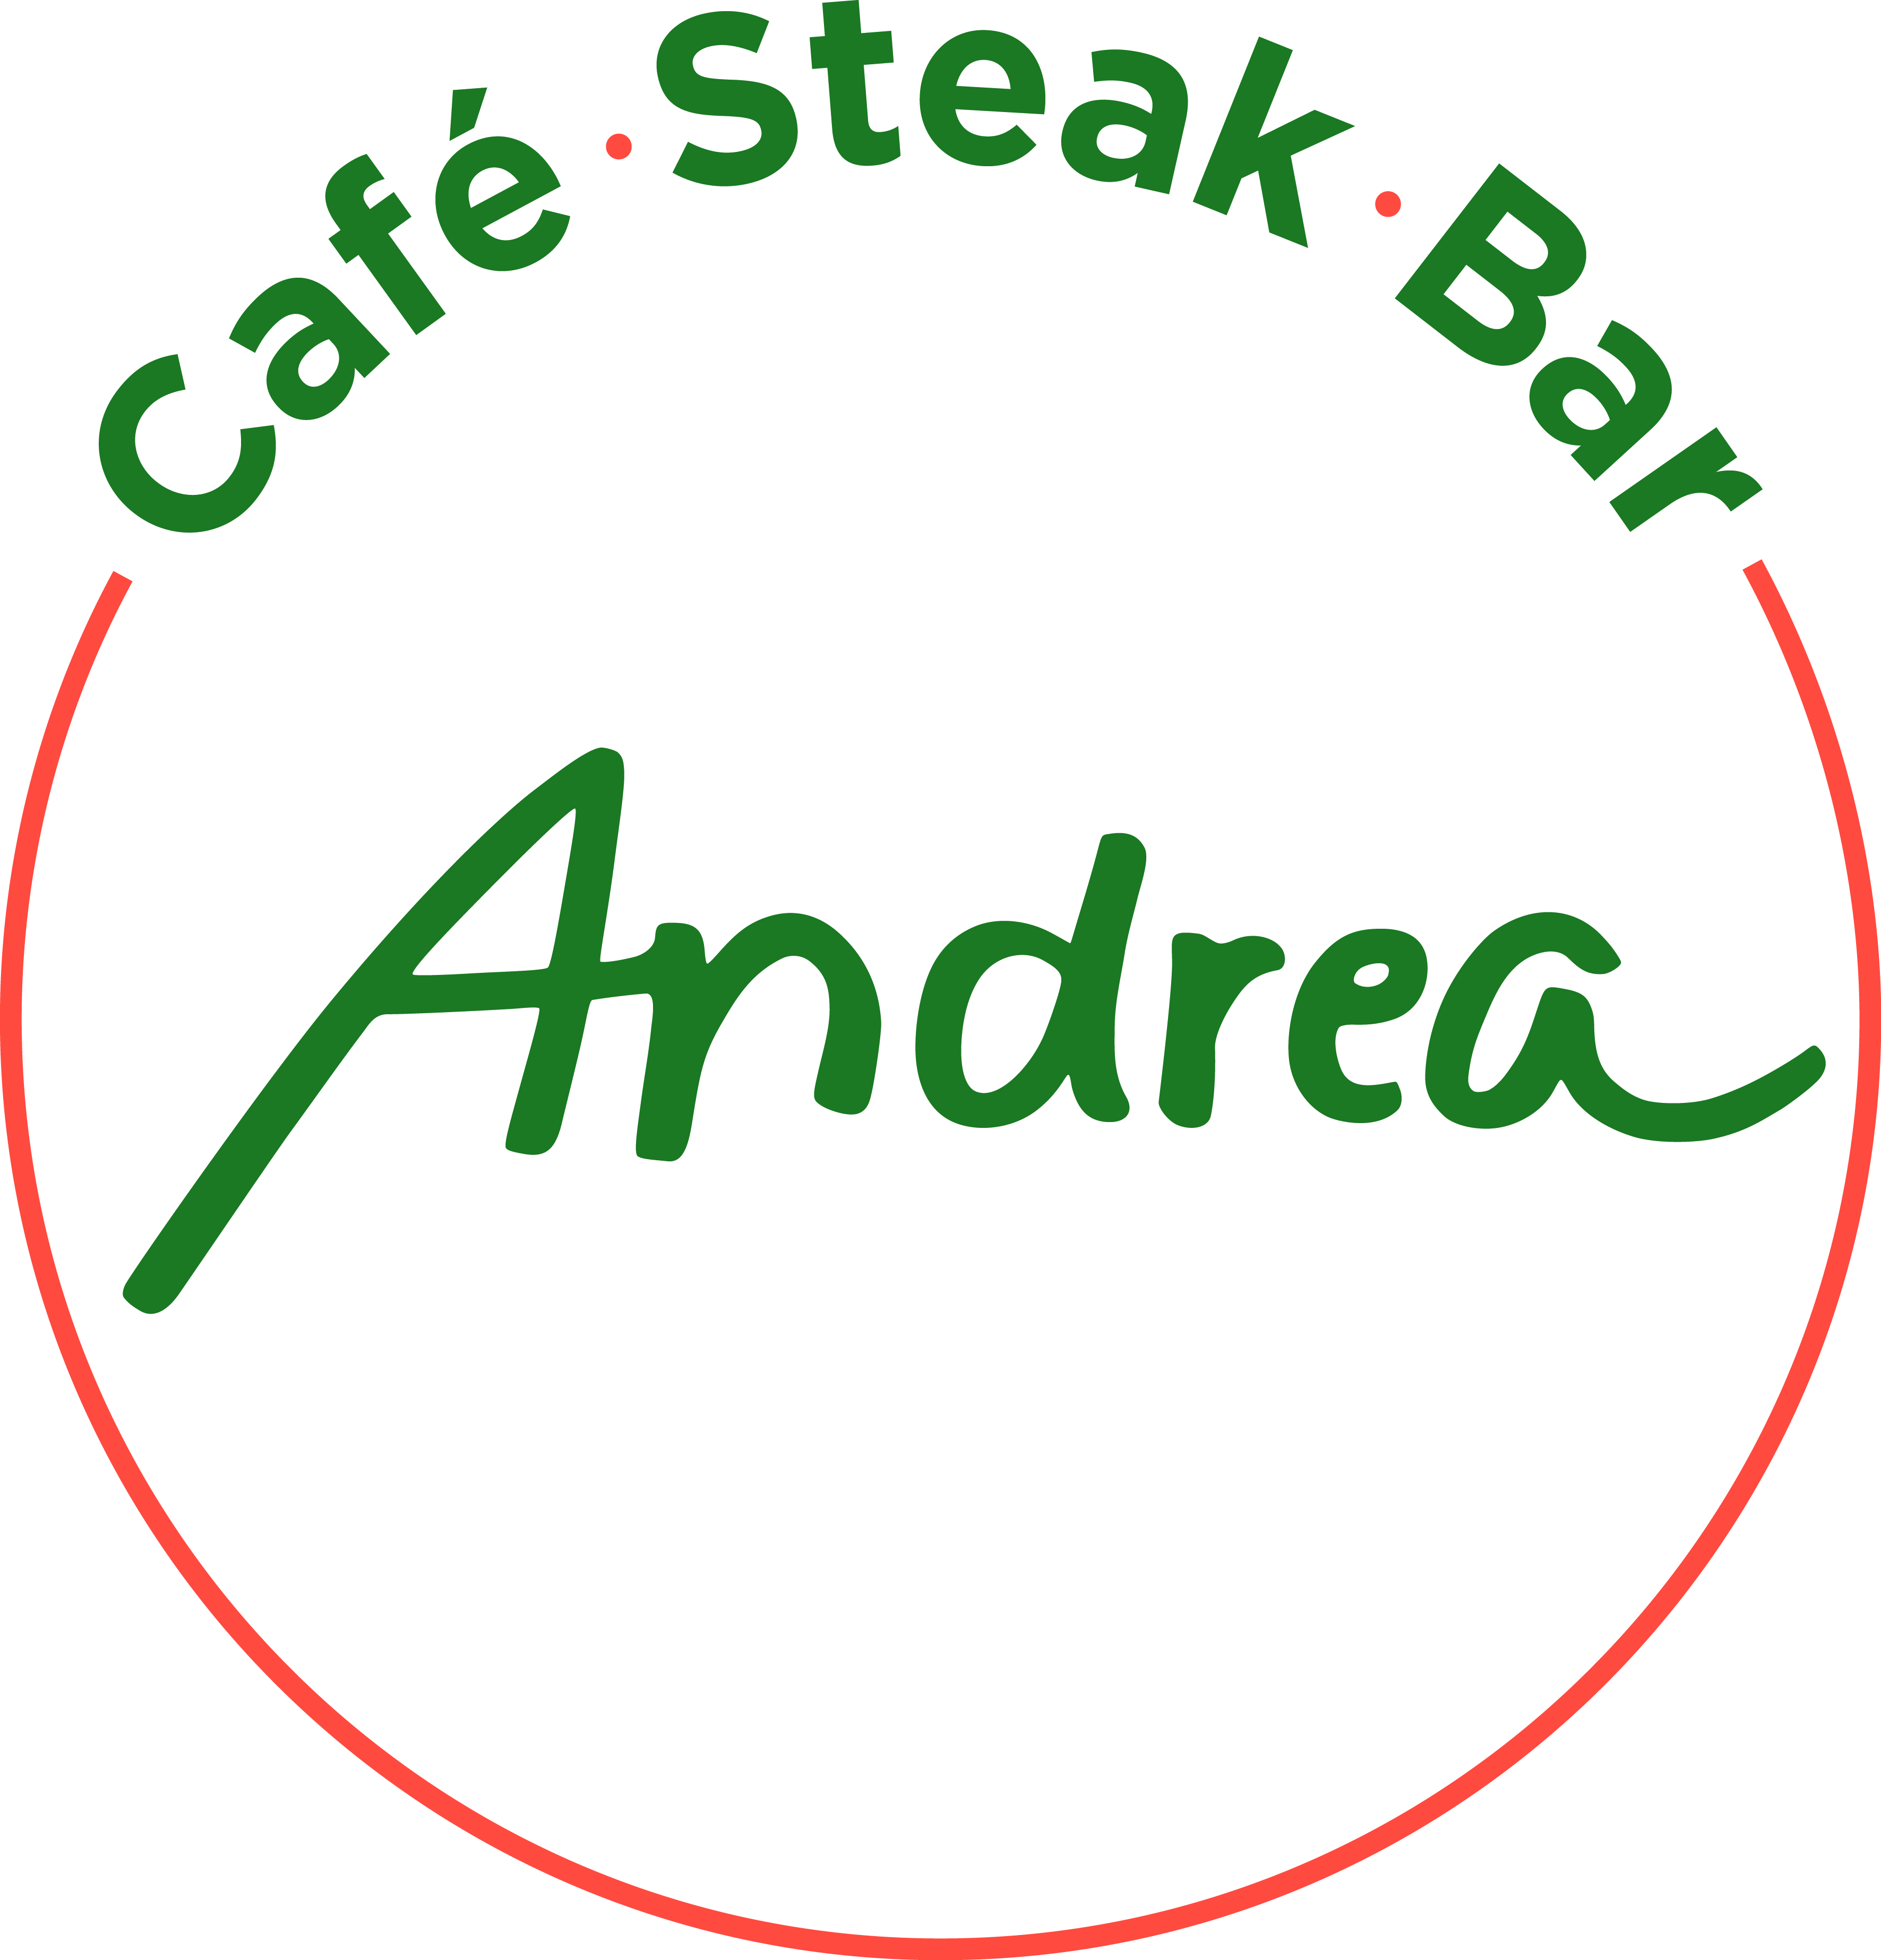 Neueröffnung Café-Steak-Bar Andrea - Newsarchiv